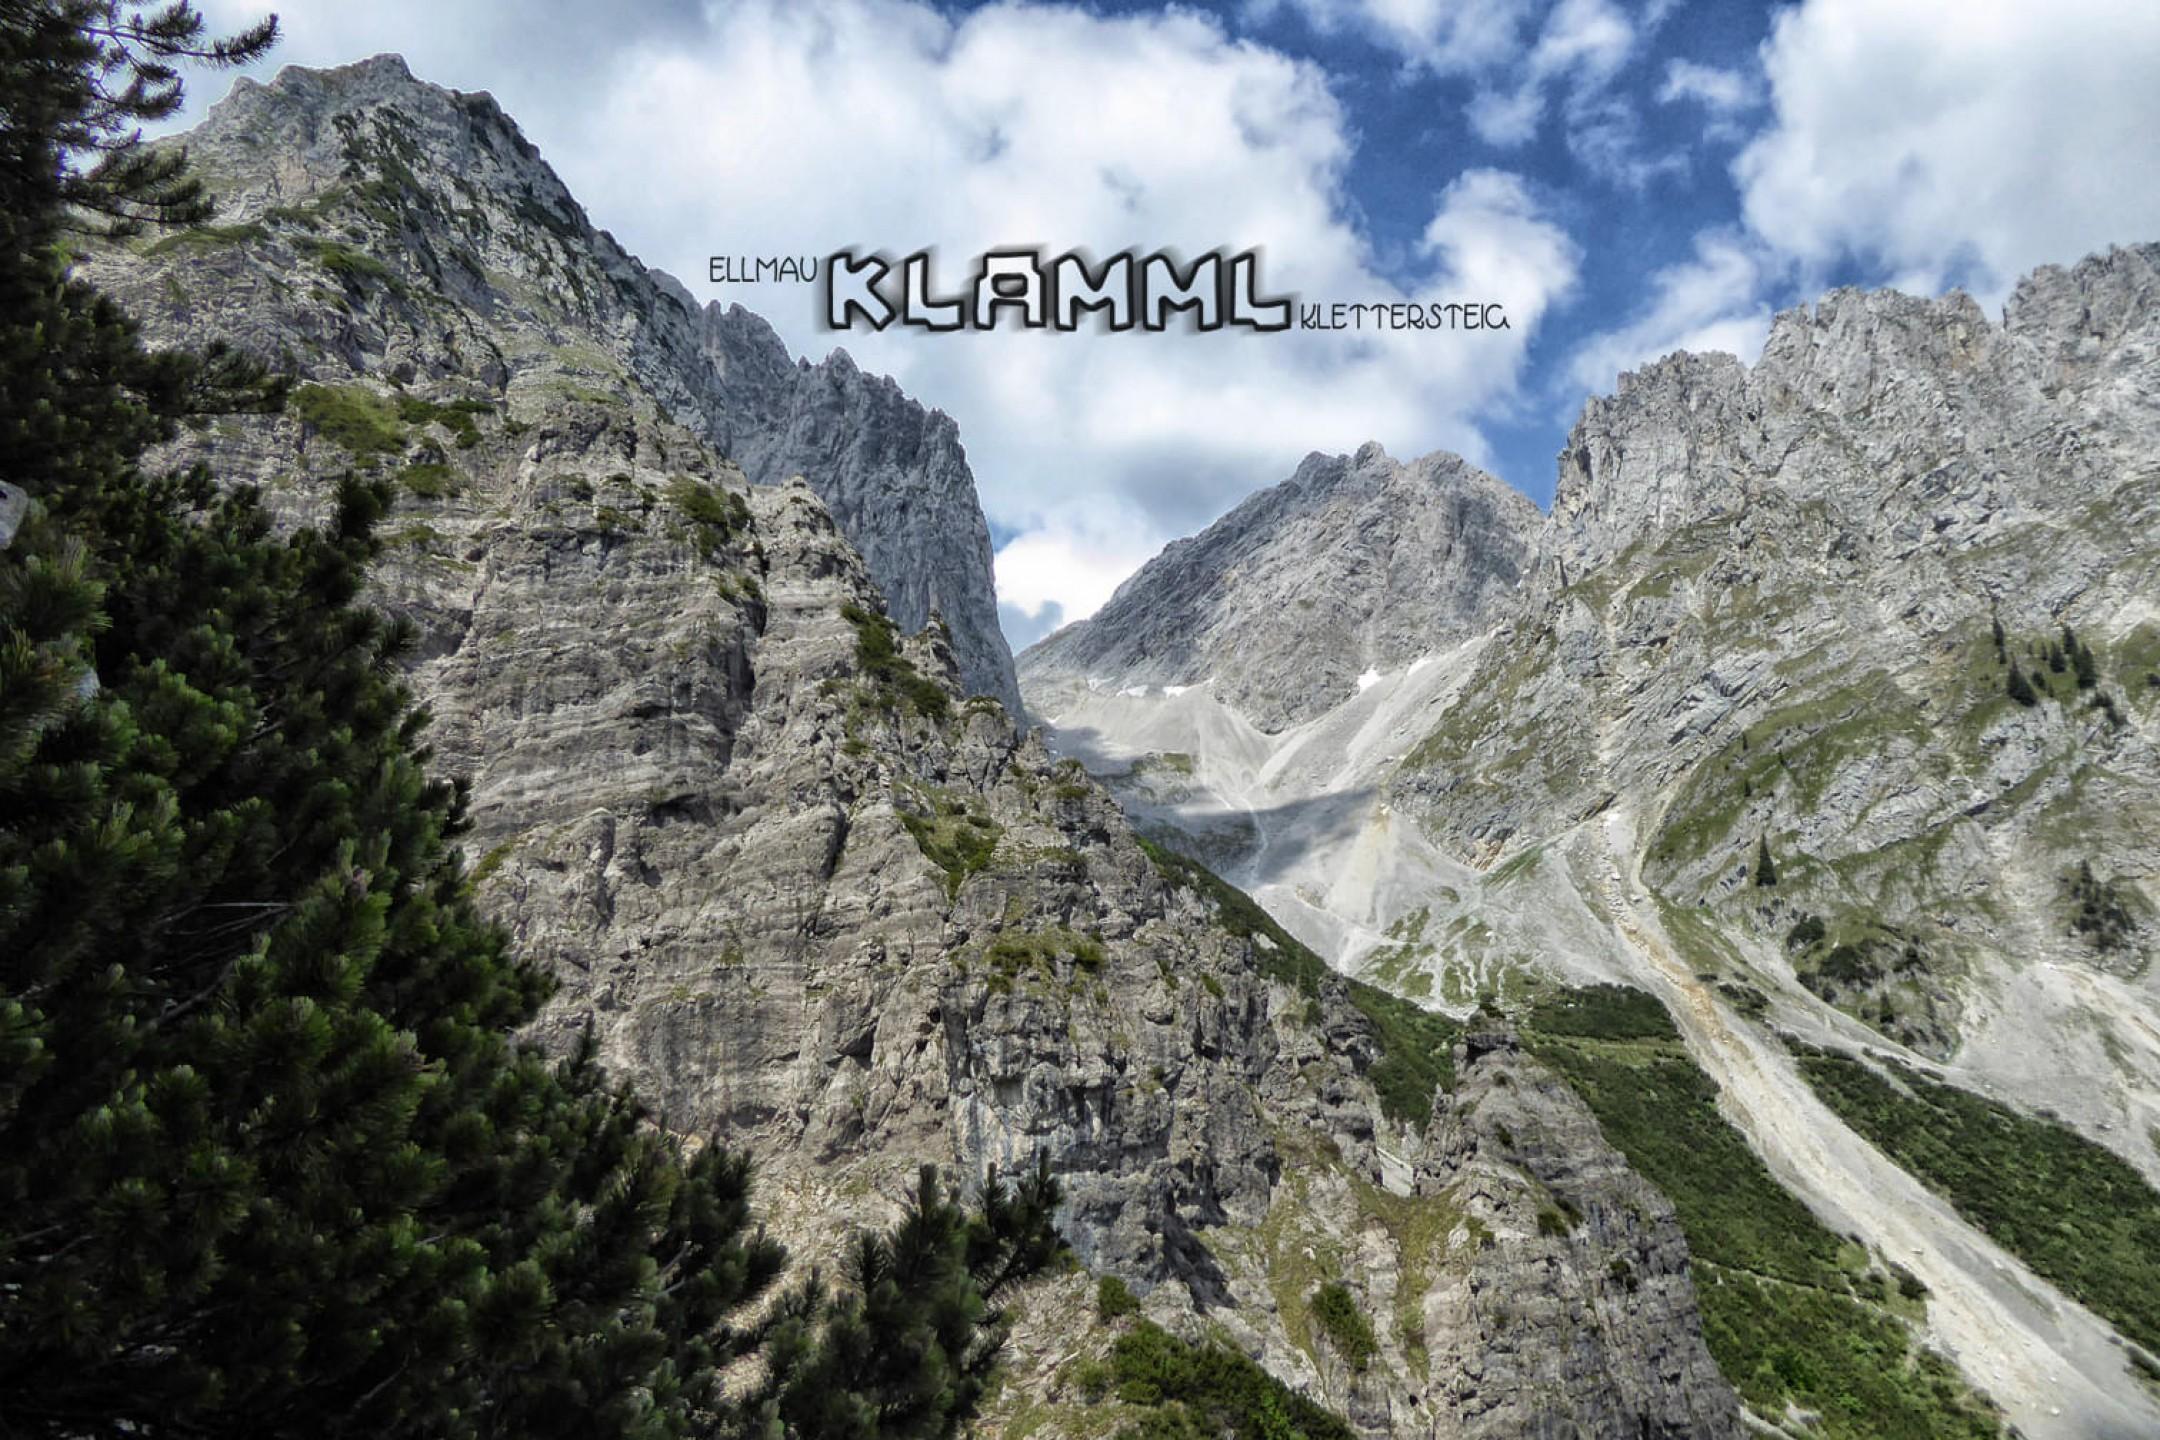 Klettersteig Klamml : Klamml steig wilder kaiser